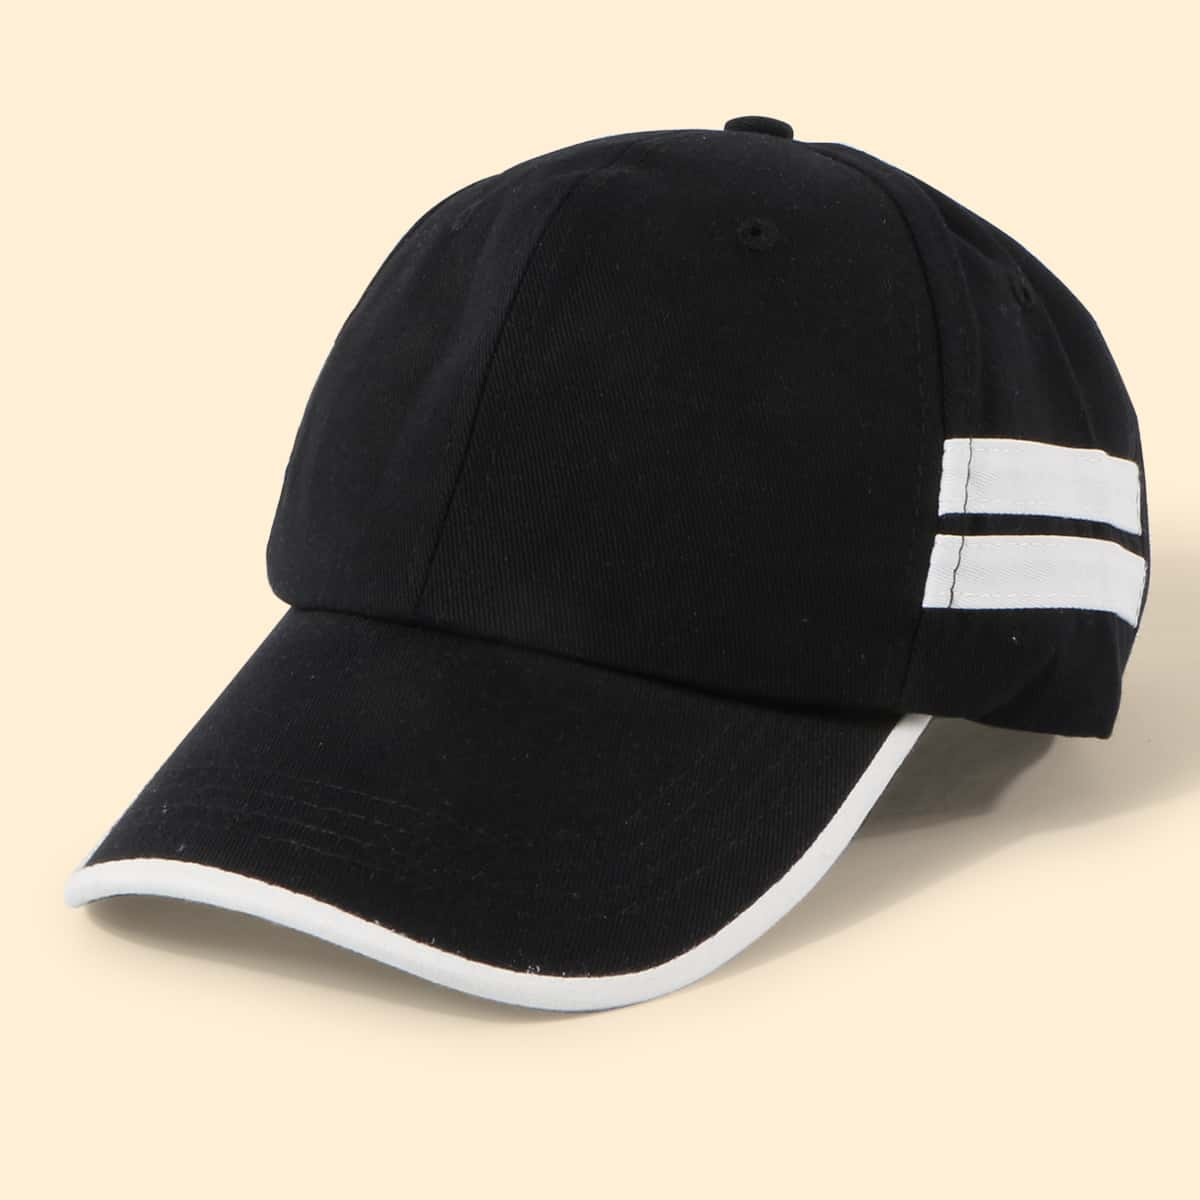 Männer Baseball Kappe mit Streifen Muster